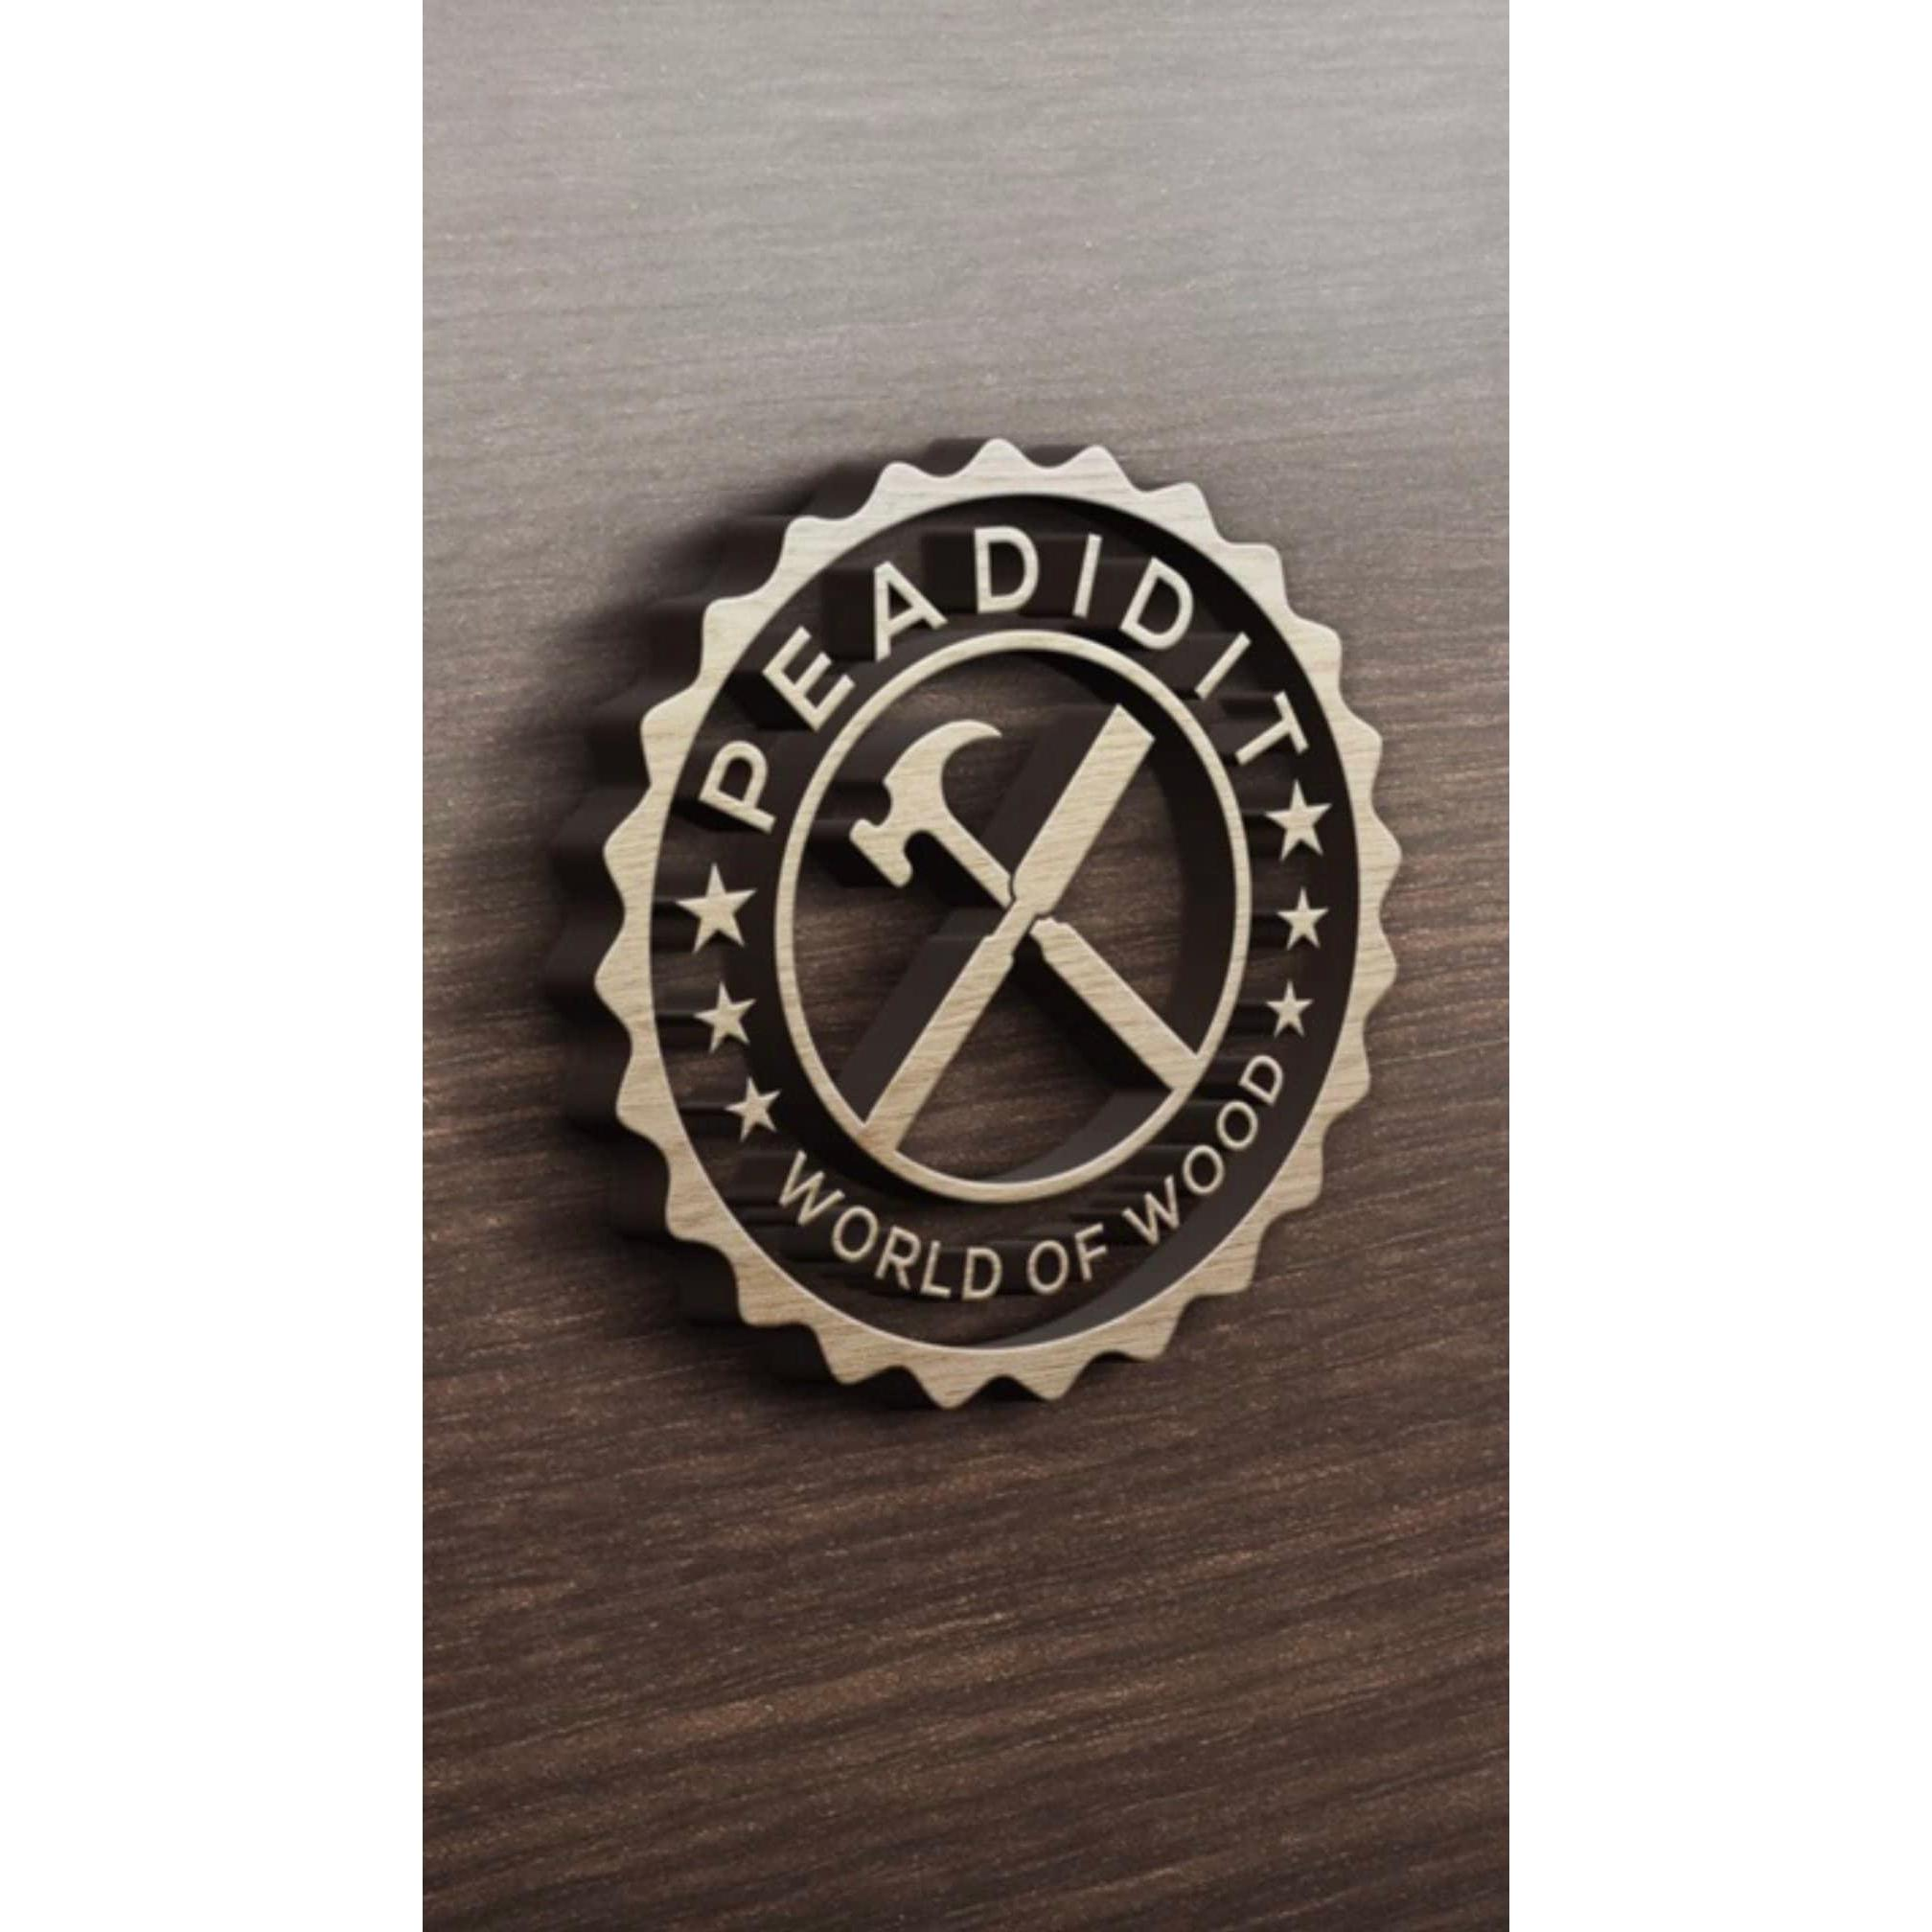 Peadidit World of Wood - Liskeard, Cornwall PL14 4DA - 07724 594127 | ShowMeLocal.com